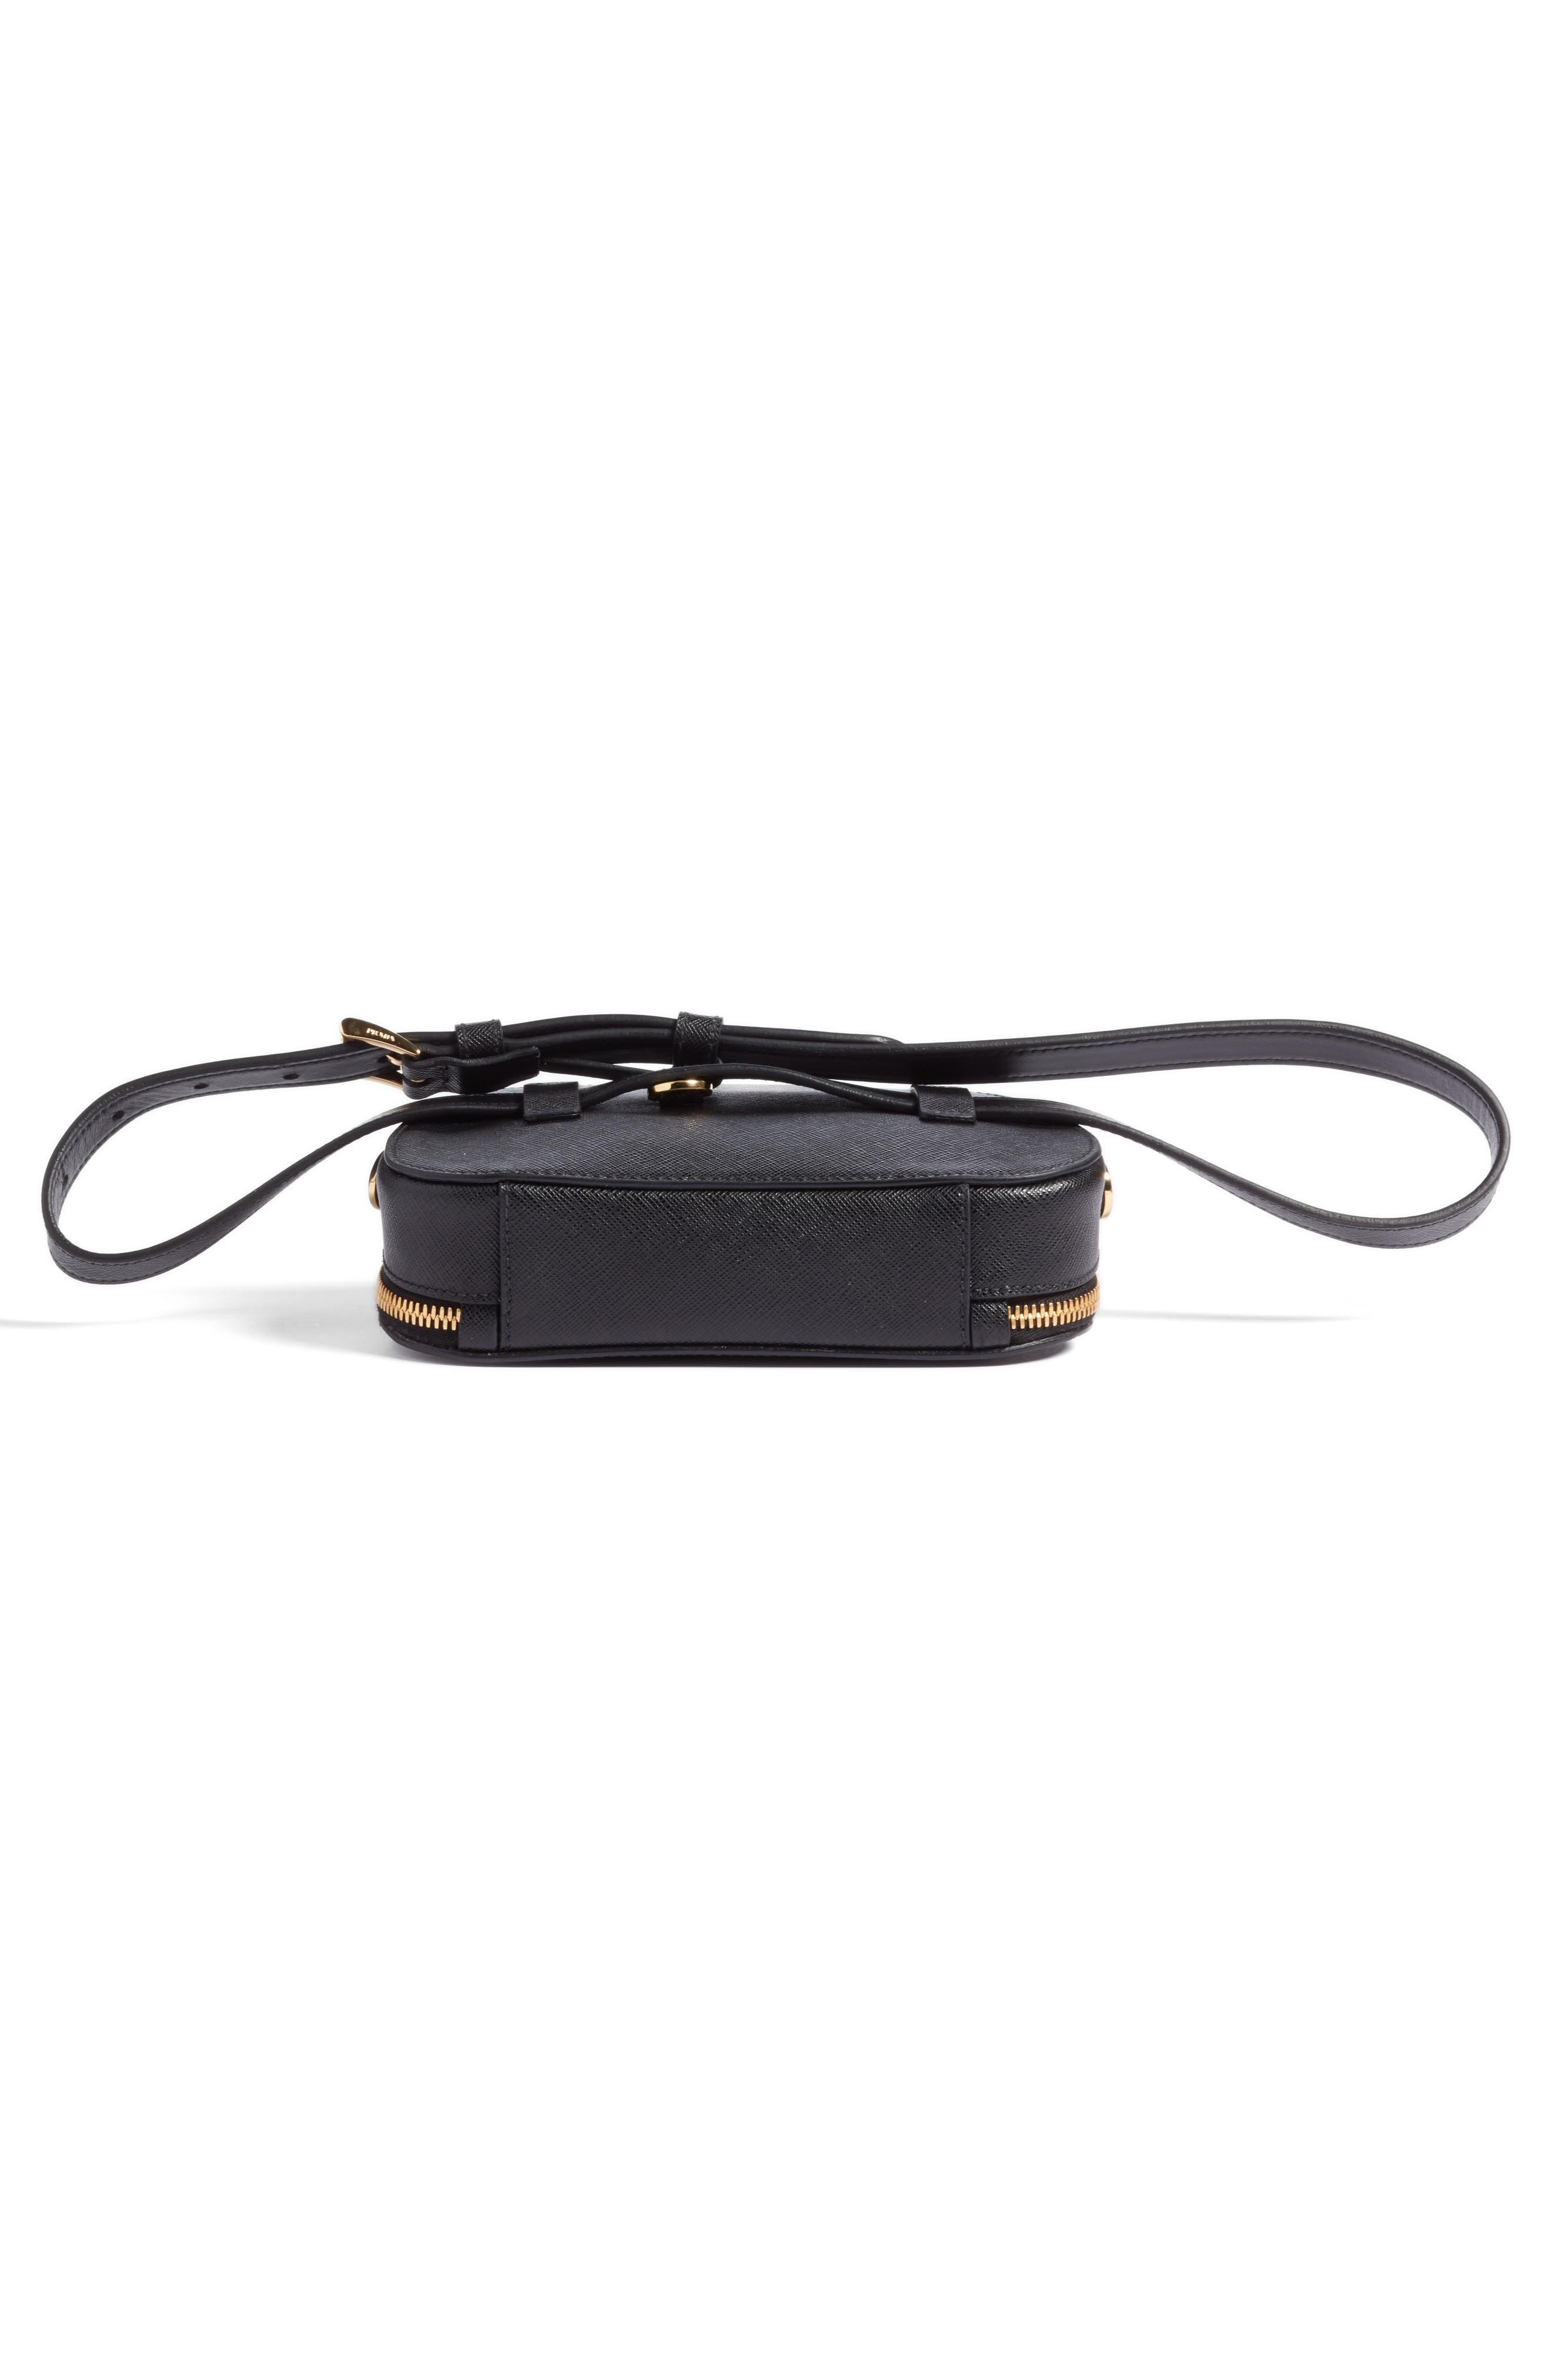 PRADA, Saffiano Leather Belt Bag, Alternate thumbnail 7, color, 001